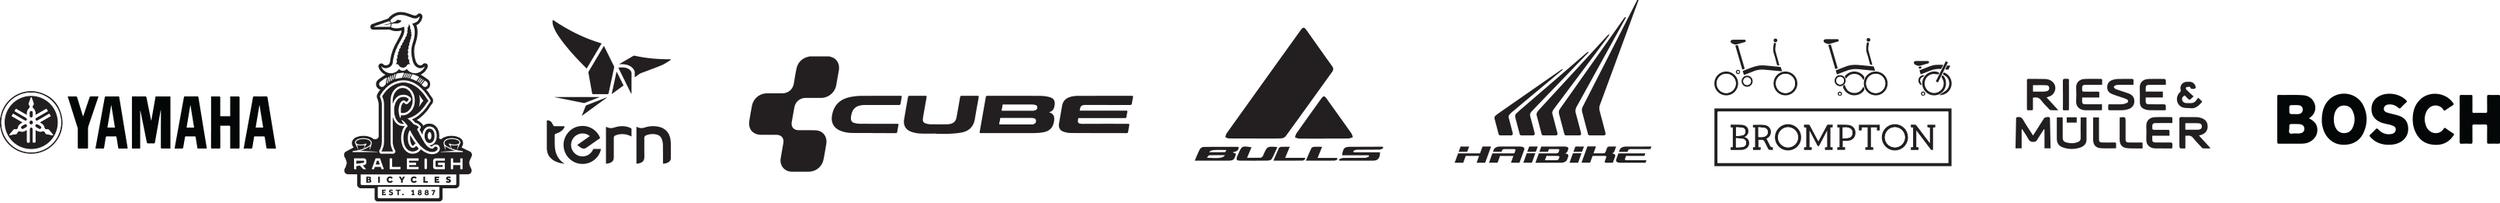 ebh brand logo.png